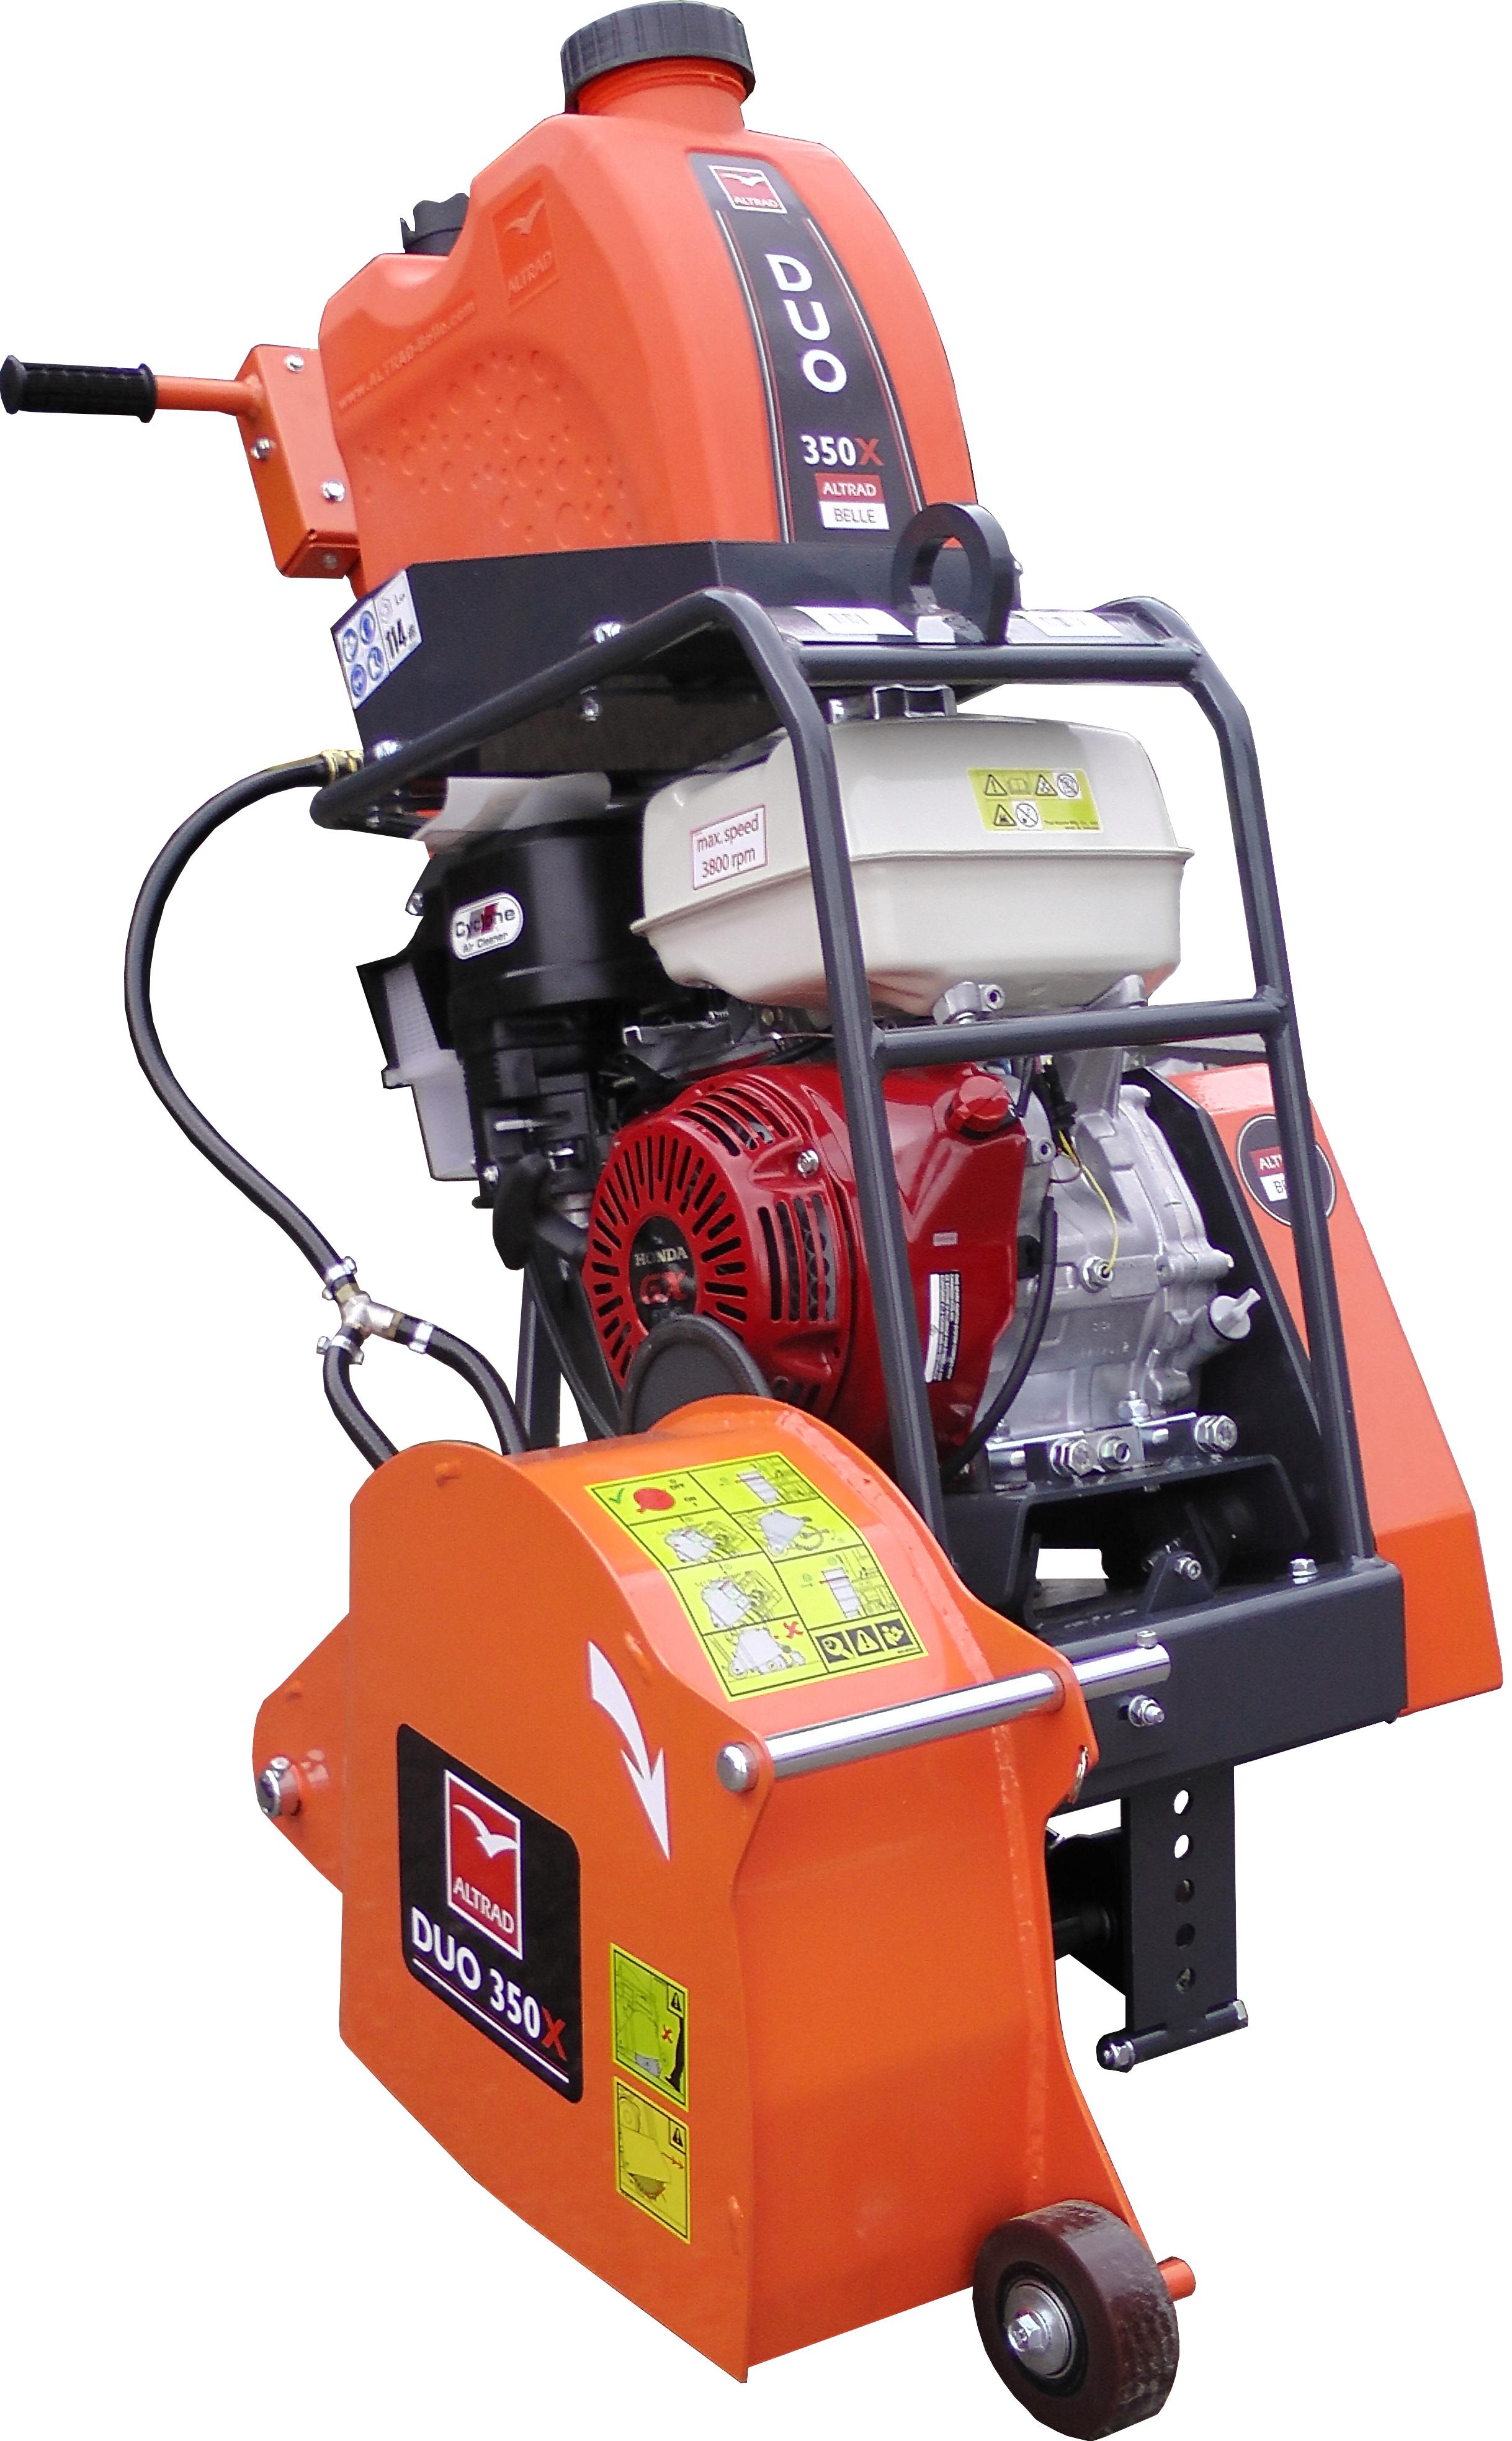 350mm Duo Floor Saw - Petrol